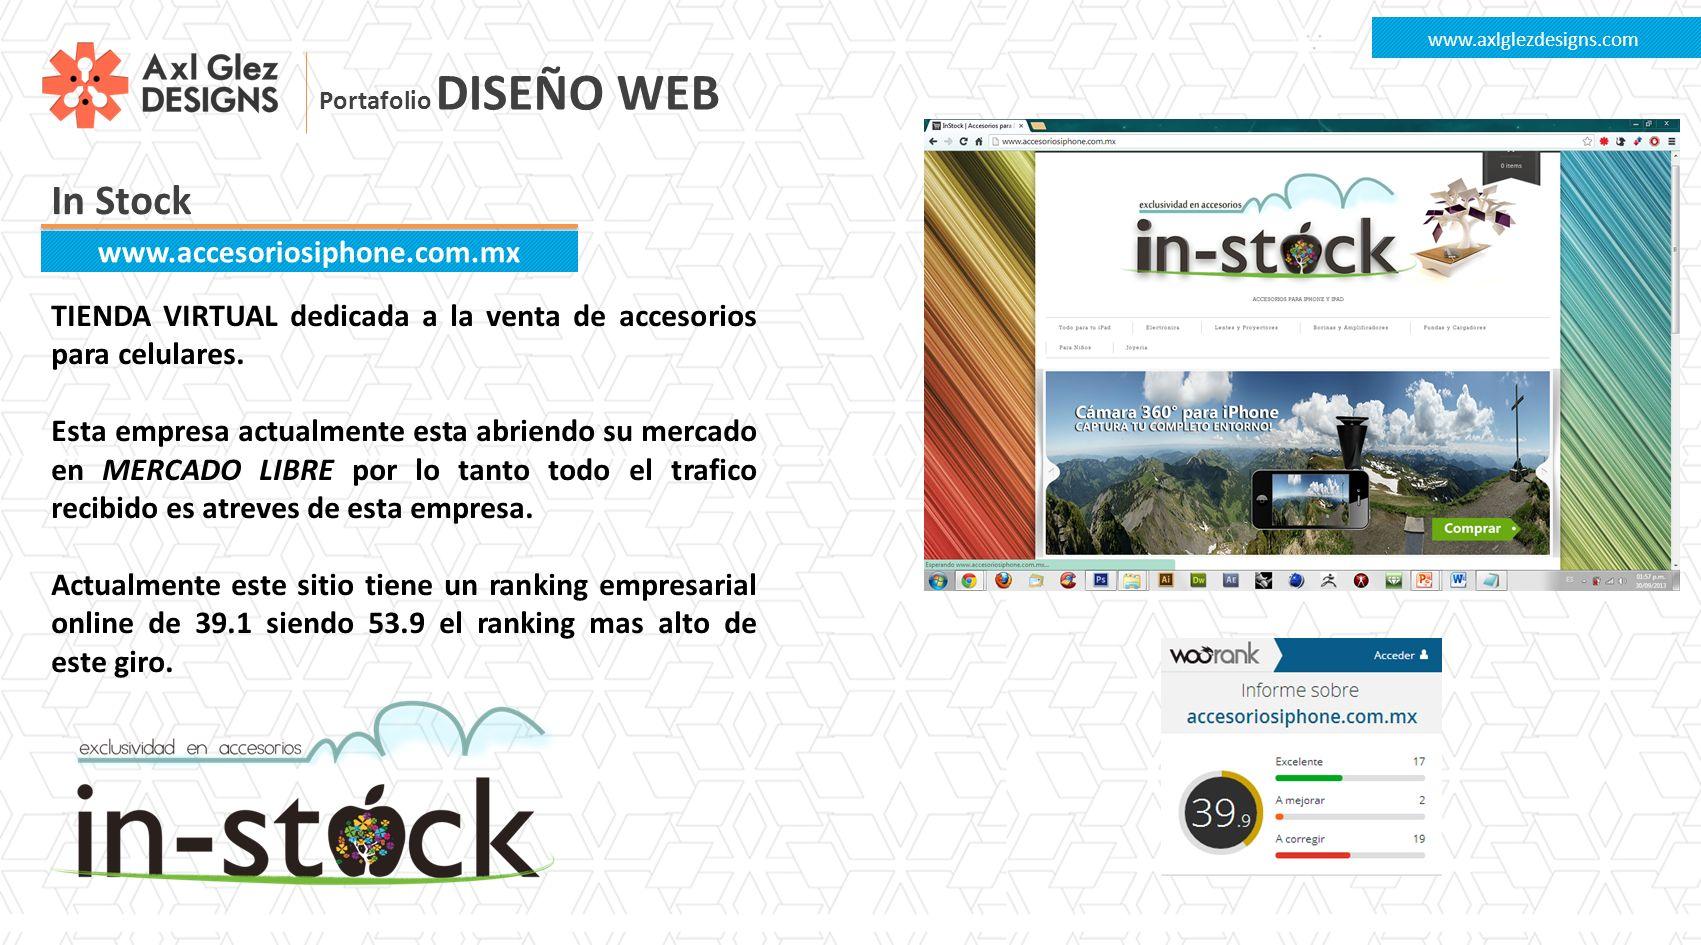 In Stock www.axlglezdesigns.com www.accesoriosiphone.com.mx TIENDA VIRTUAL dedicada a la venta de accesorios para celulares. Esta empresa actualmente